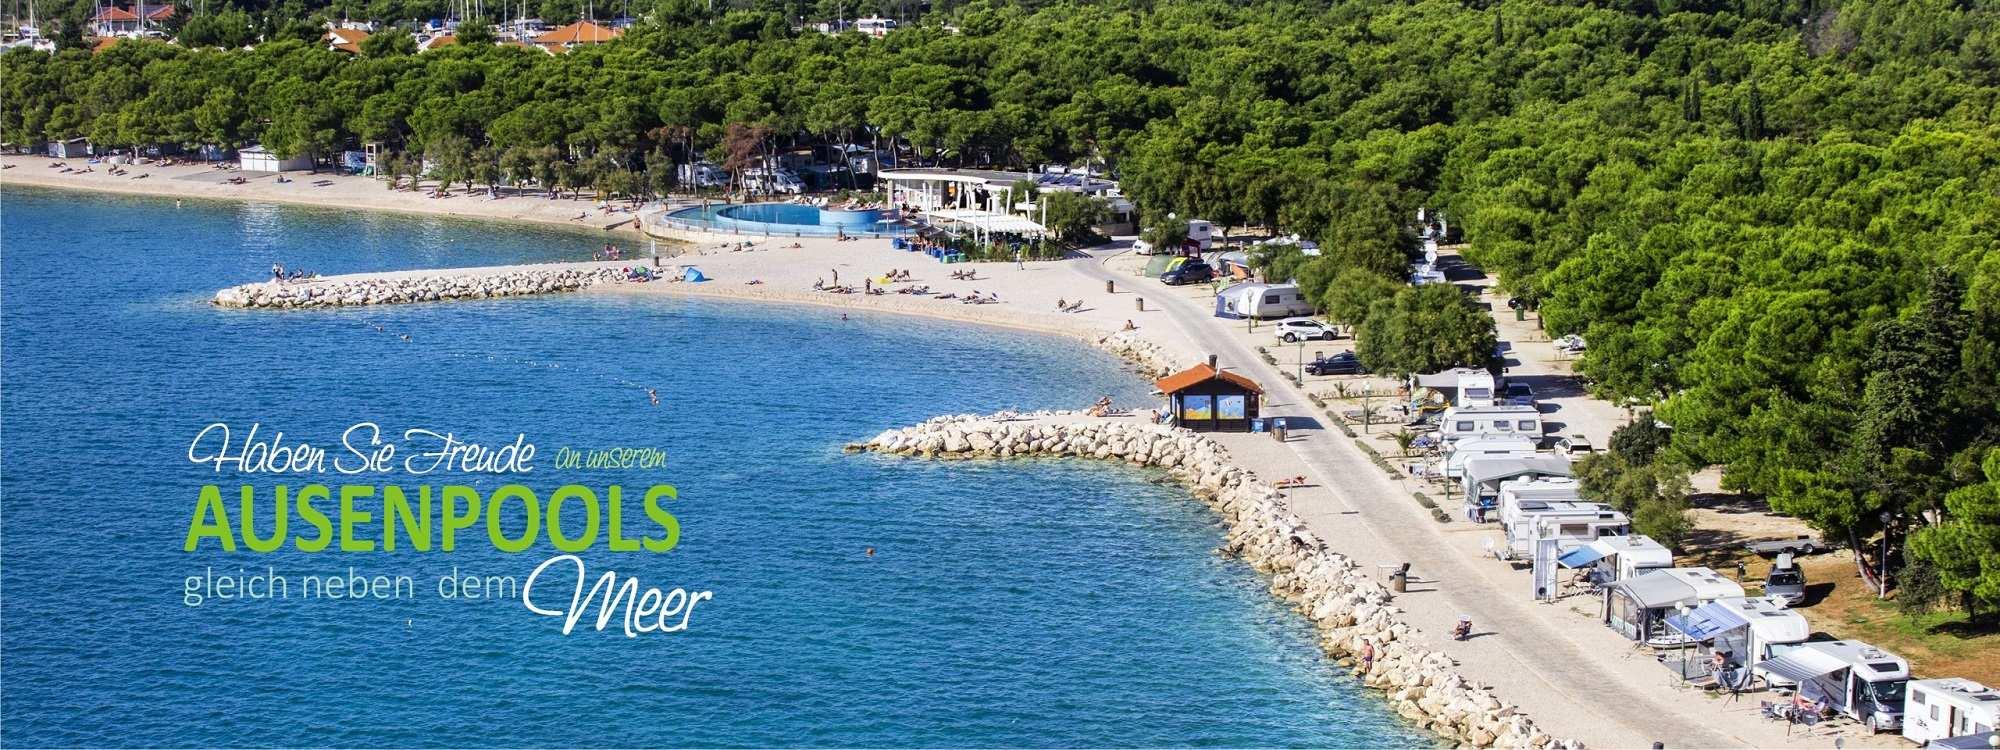 Solaris_camping_beach_resort_kroatien_ausenpool_gleich_neben_dem_meer_angebot